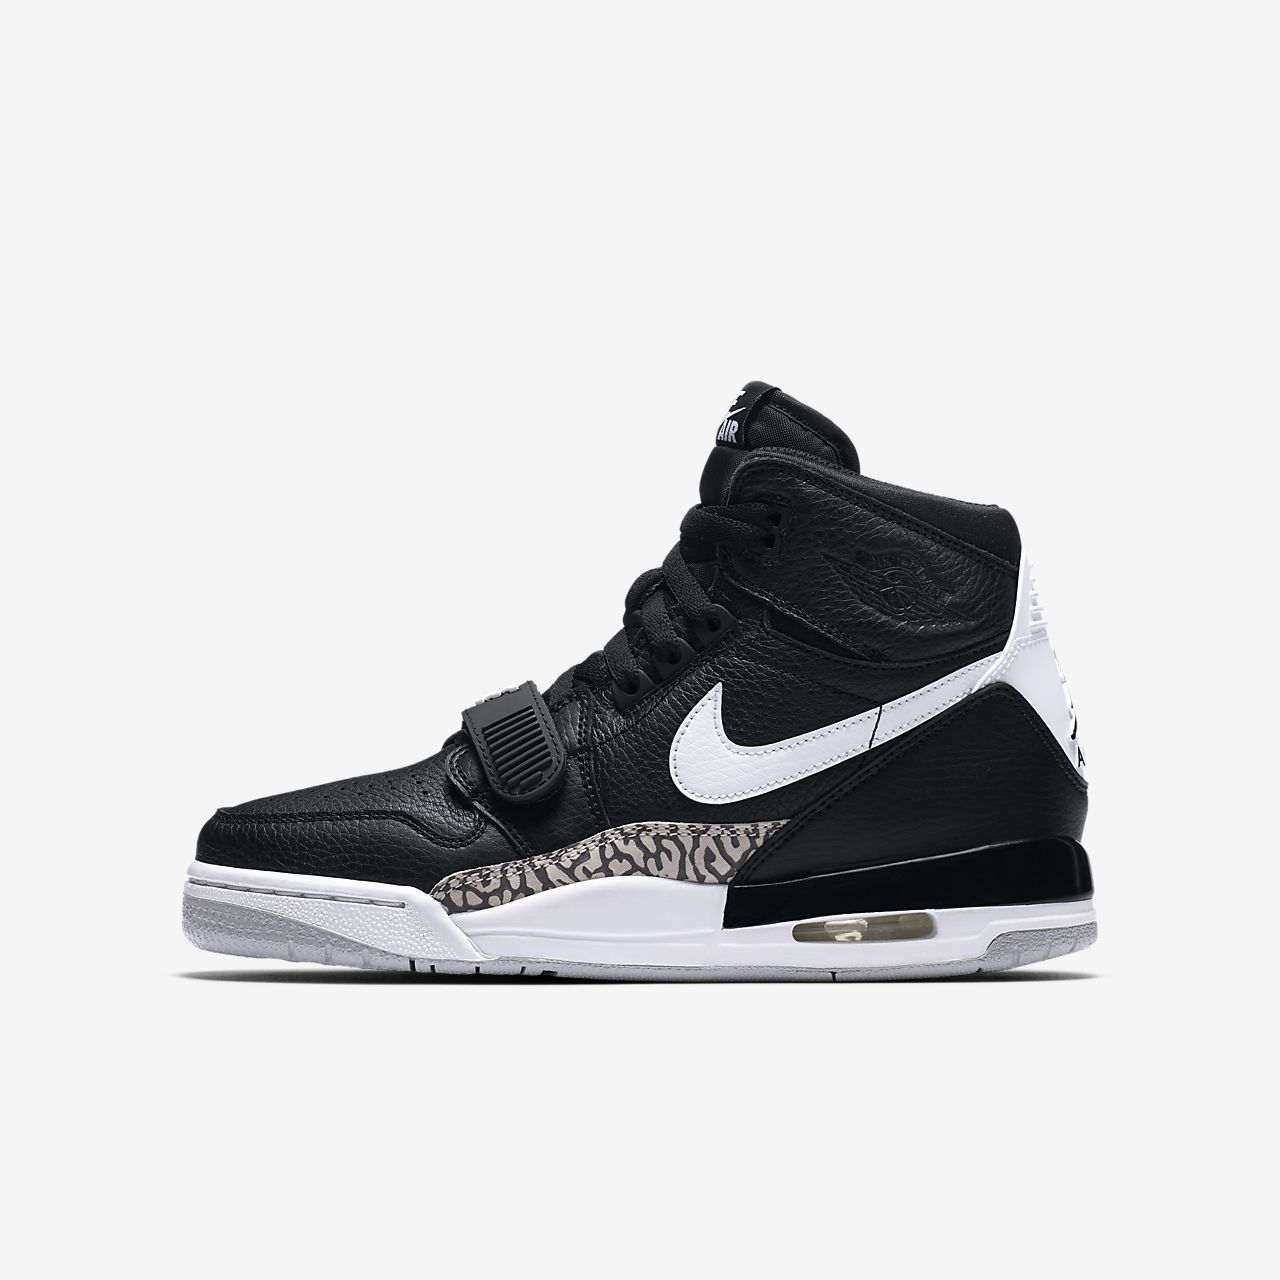 new concept d4ffa e670e ... Air Jordan Legacy 312-sko til store børn